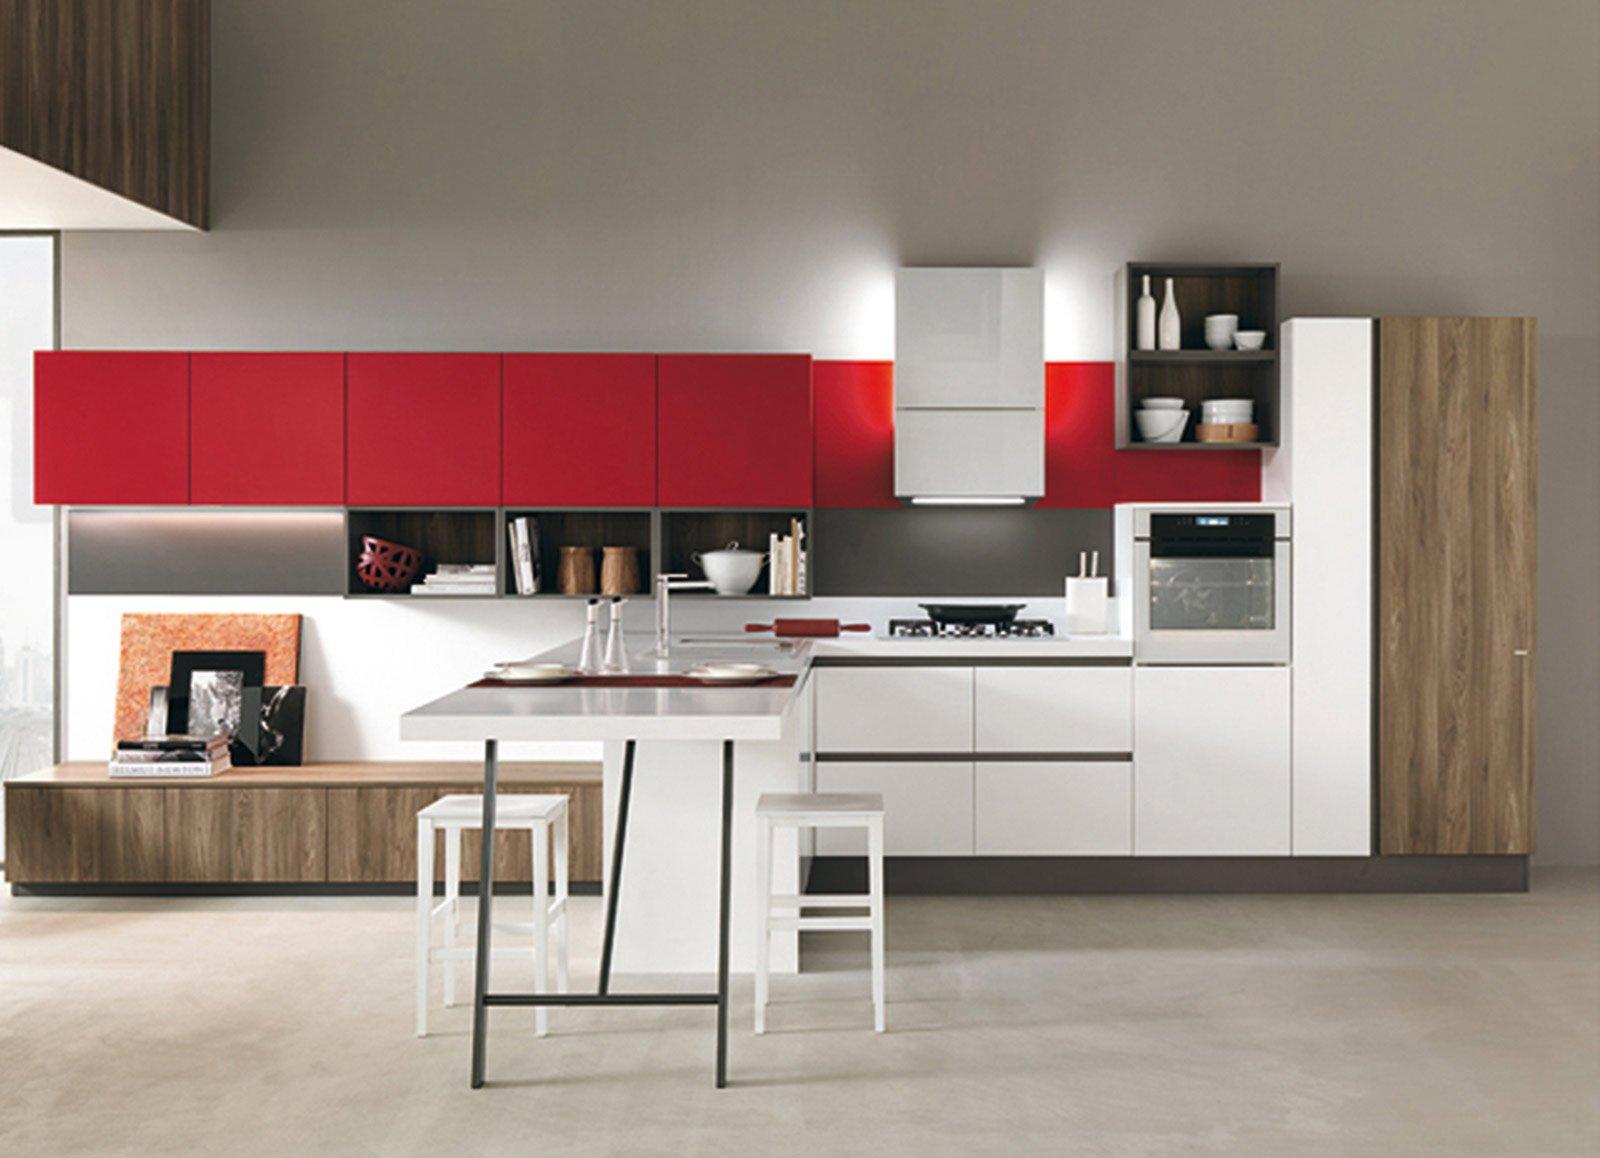 Cucine colori fluo per arredarla cose di casa - Colori adatti alla cucina ...